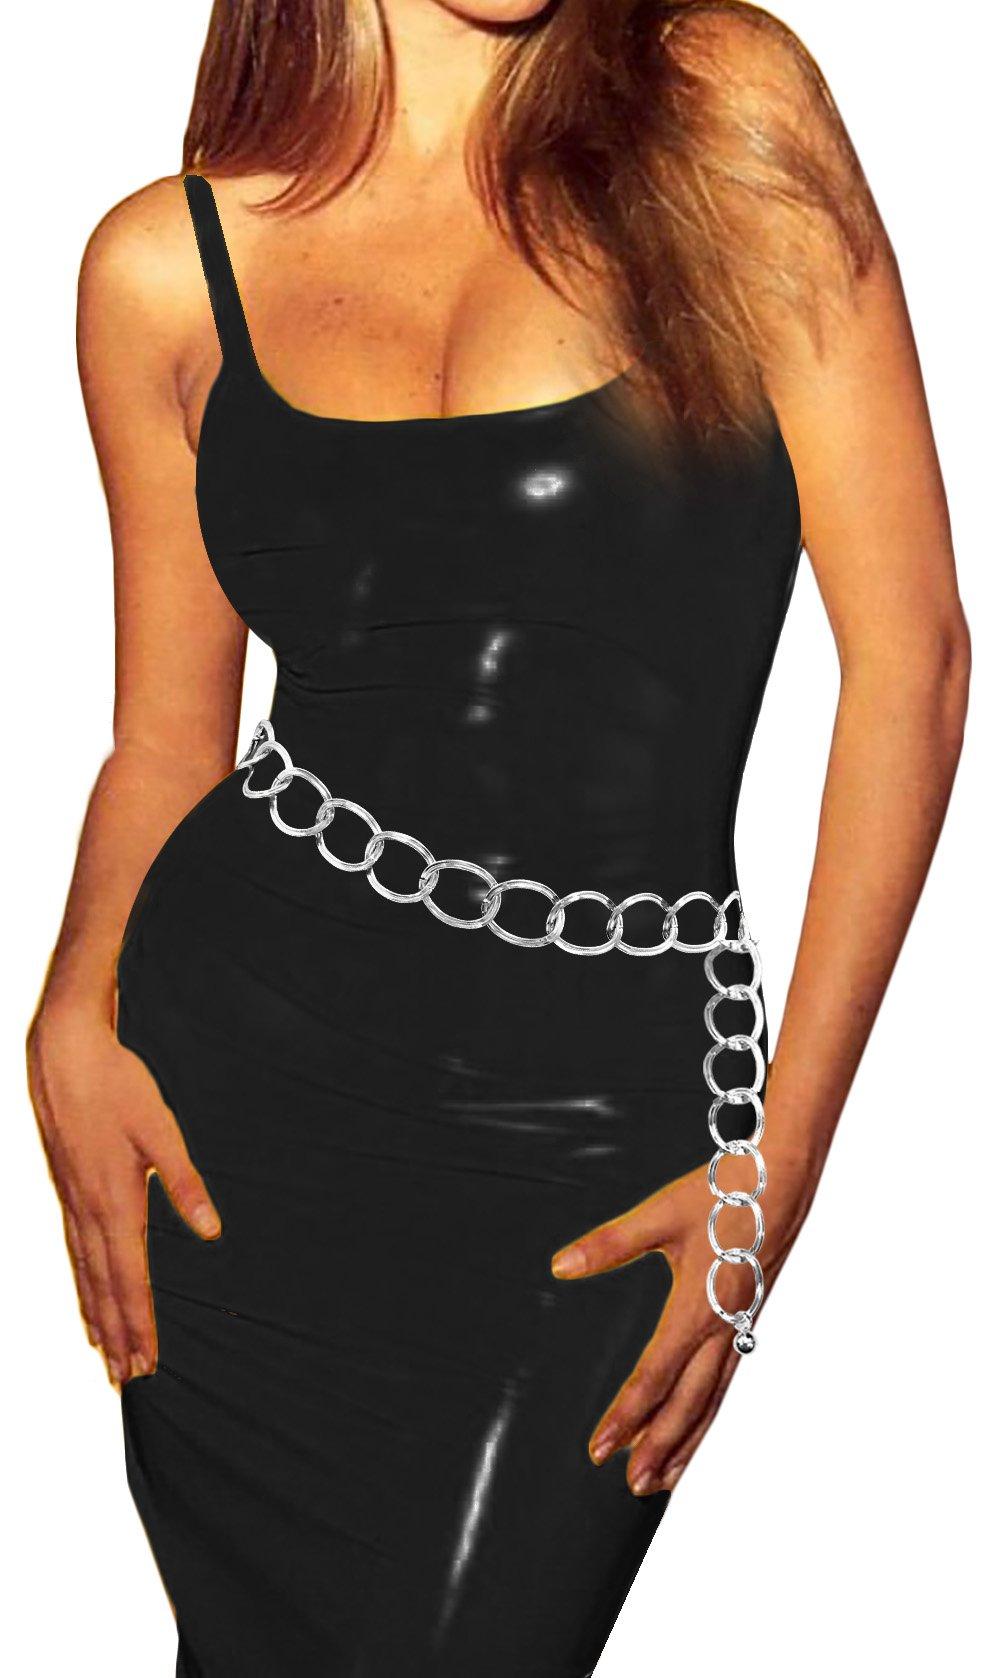 Luna Sosano Womens Shiny Stone Fashion Antique Chain Belt - Type 110 - Silver by Luna Sosano (Image #1)